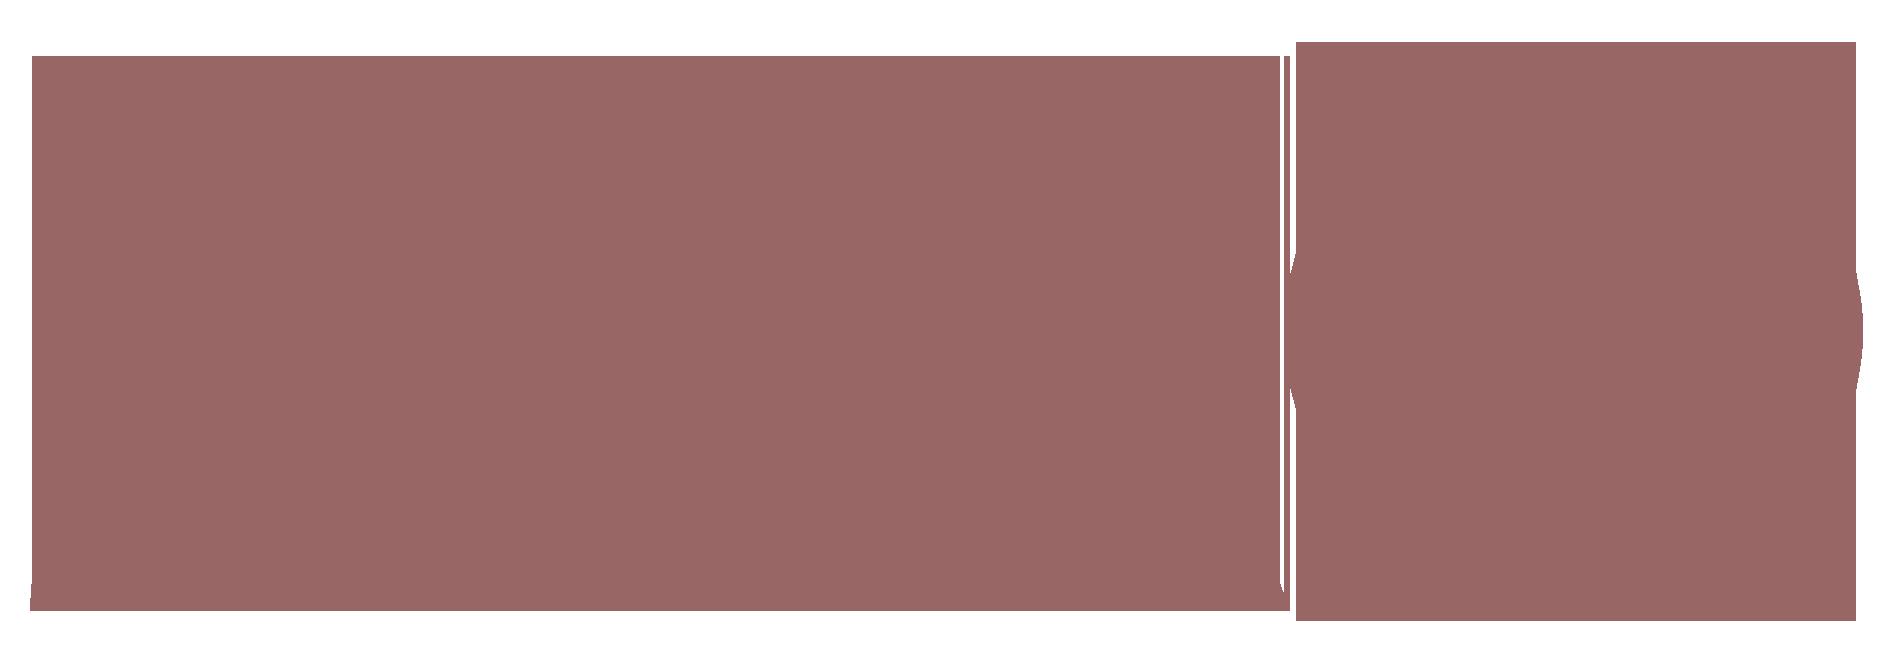 Mao logo